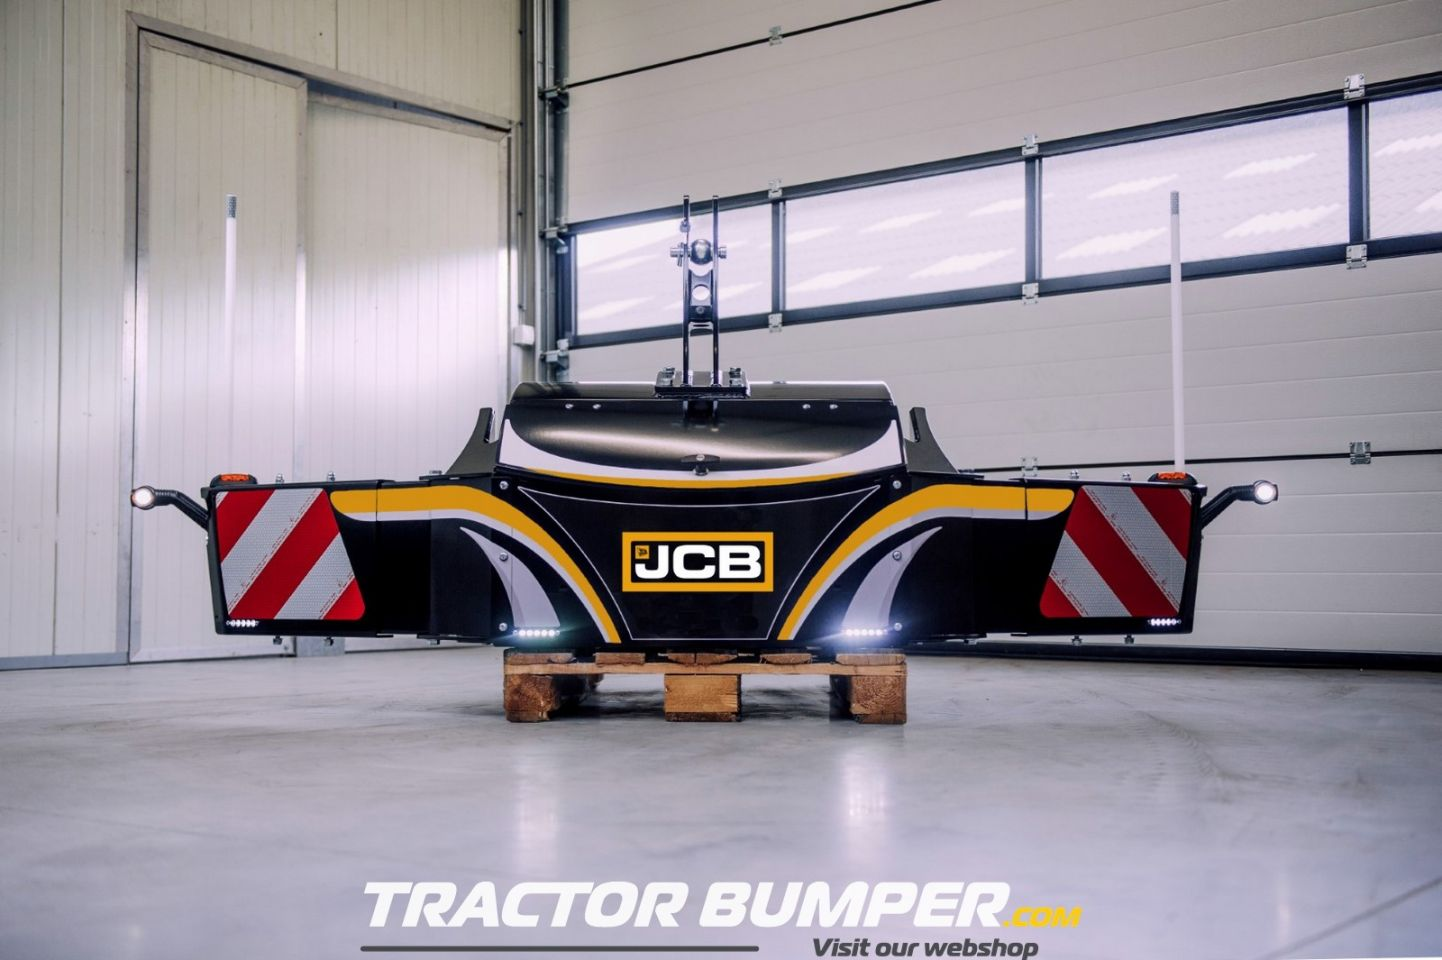 Trekker bumper JCB frontgewicht